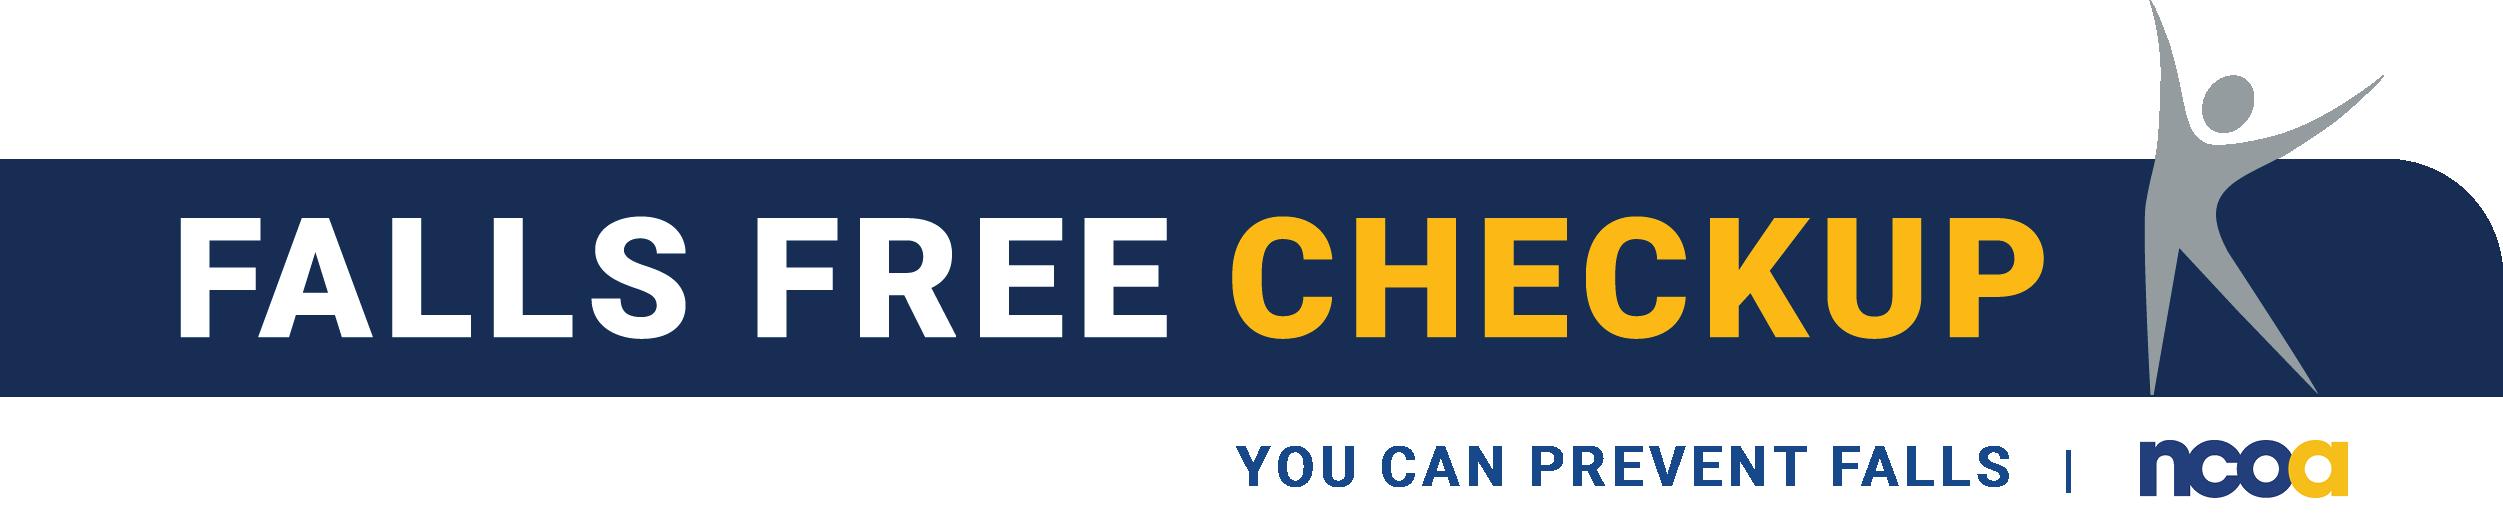 Falls Free Checkup Logo